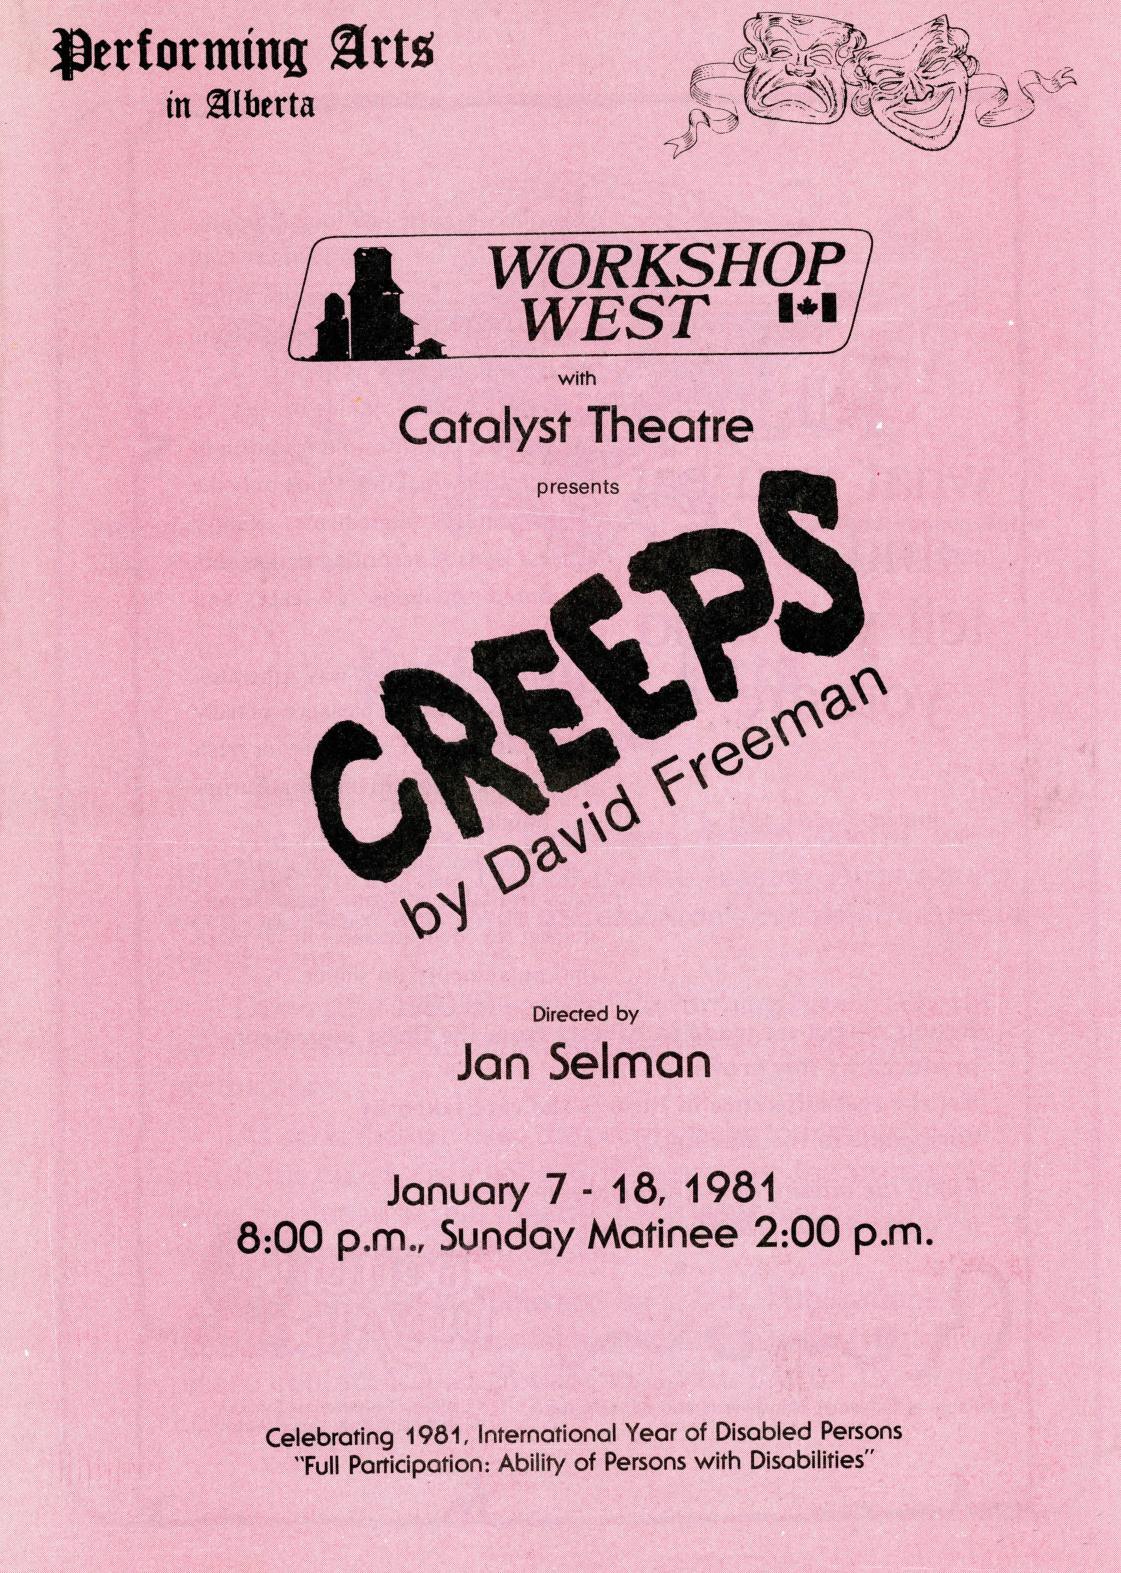 Creeps (January, 1981) - Program Information (1)-page-001.jpg